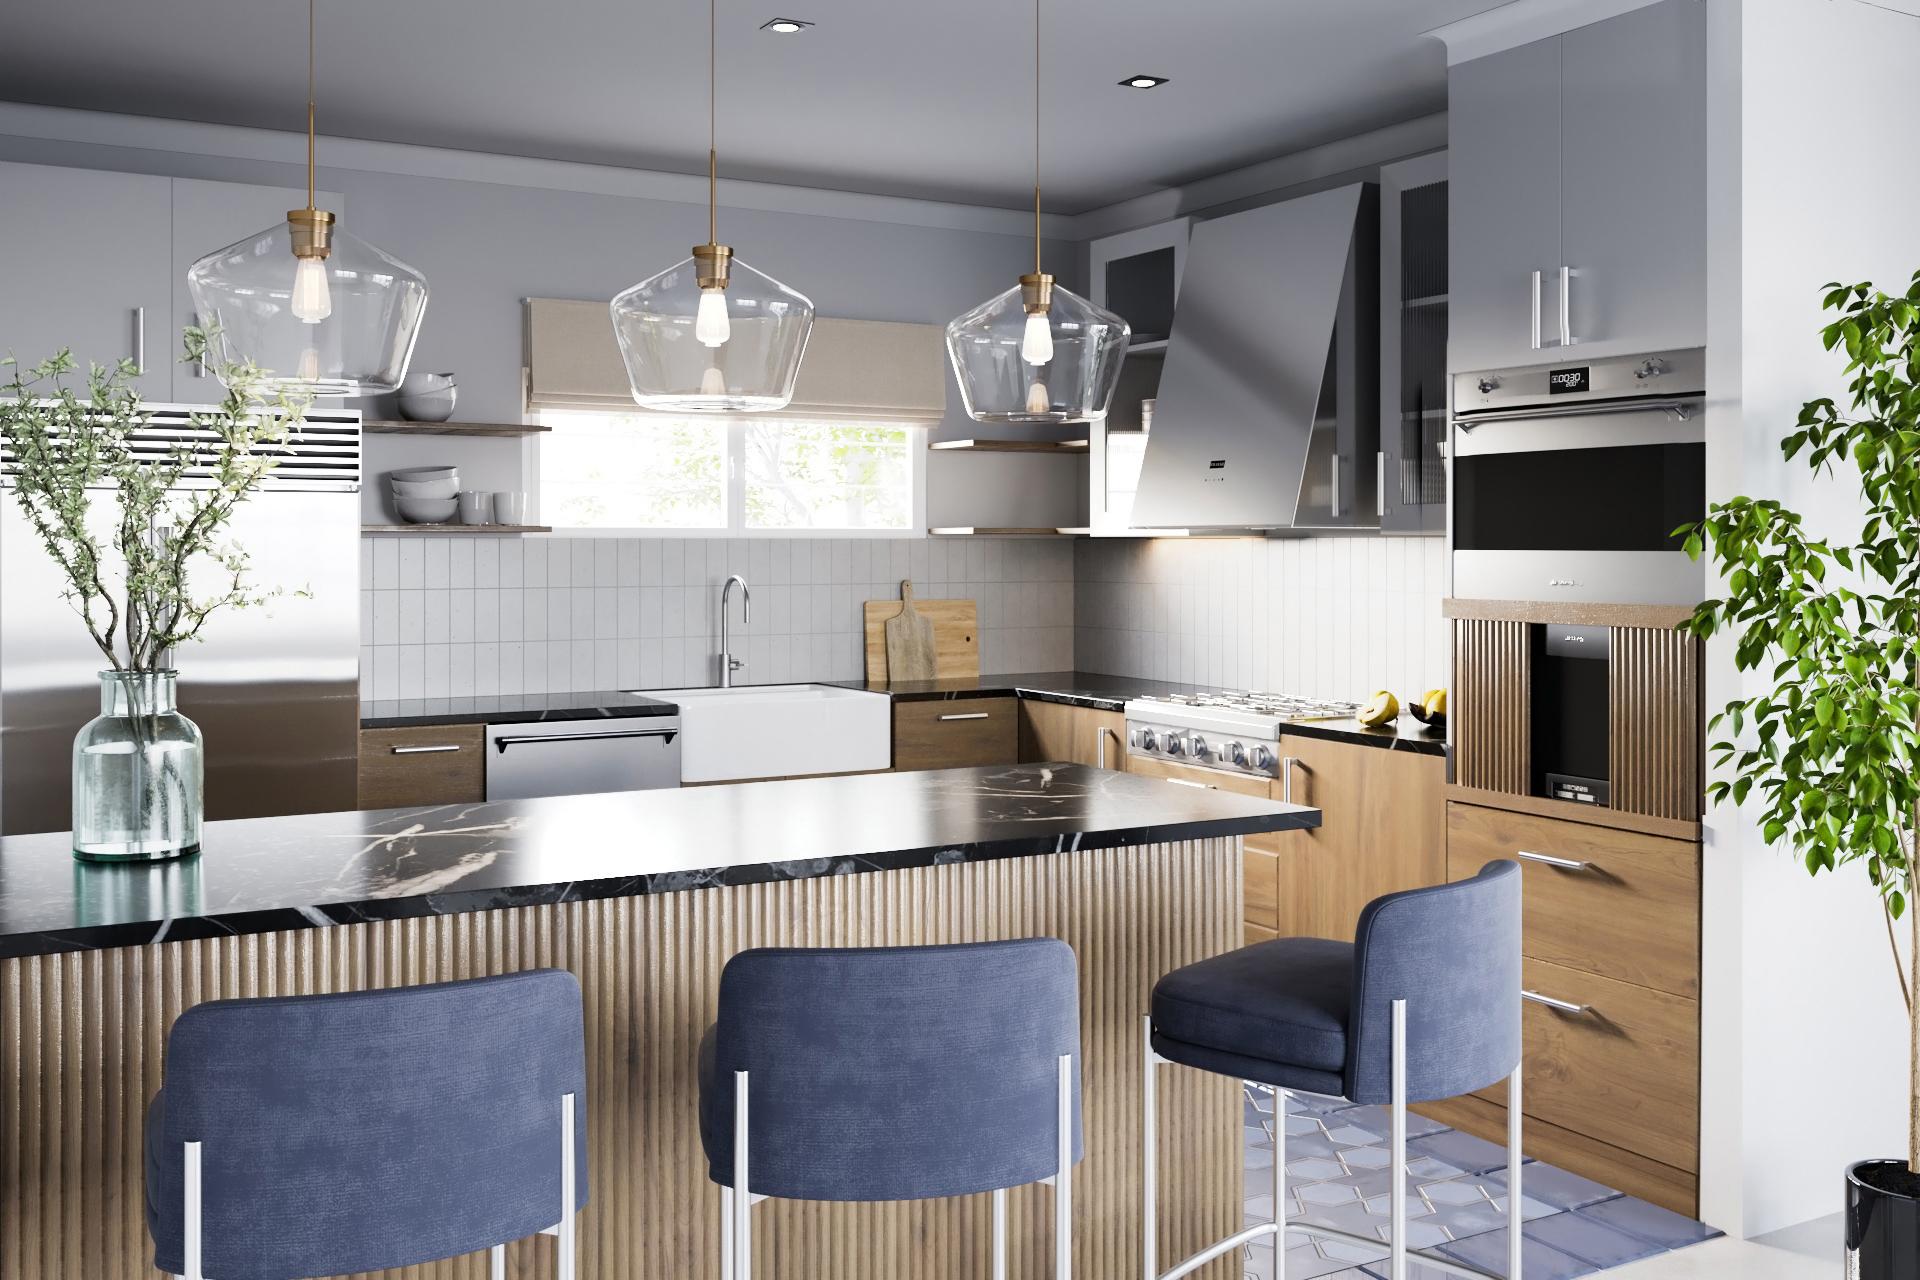 Craftsman Revival Kitchen